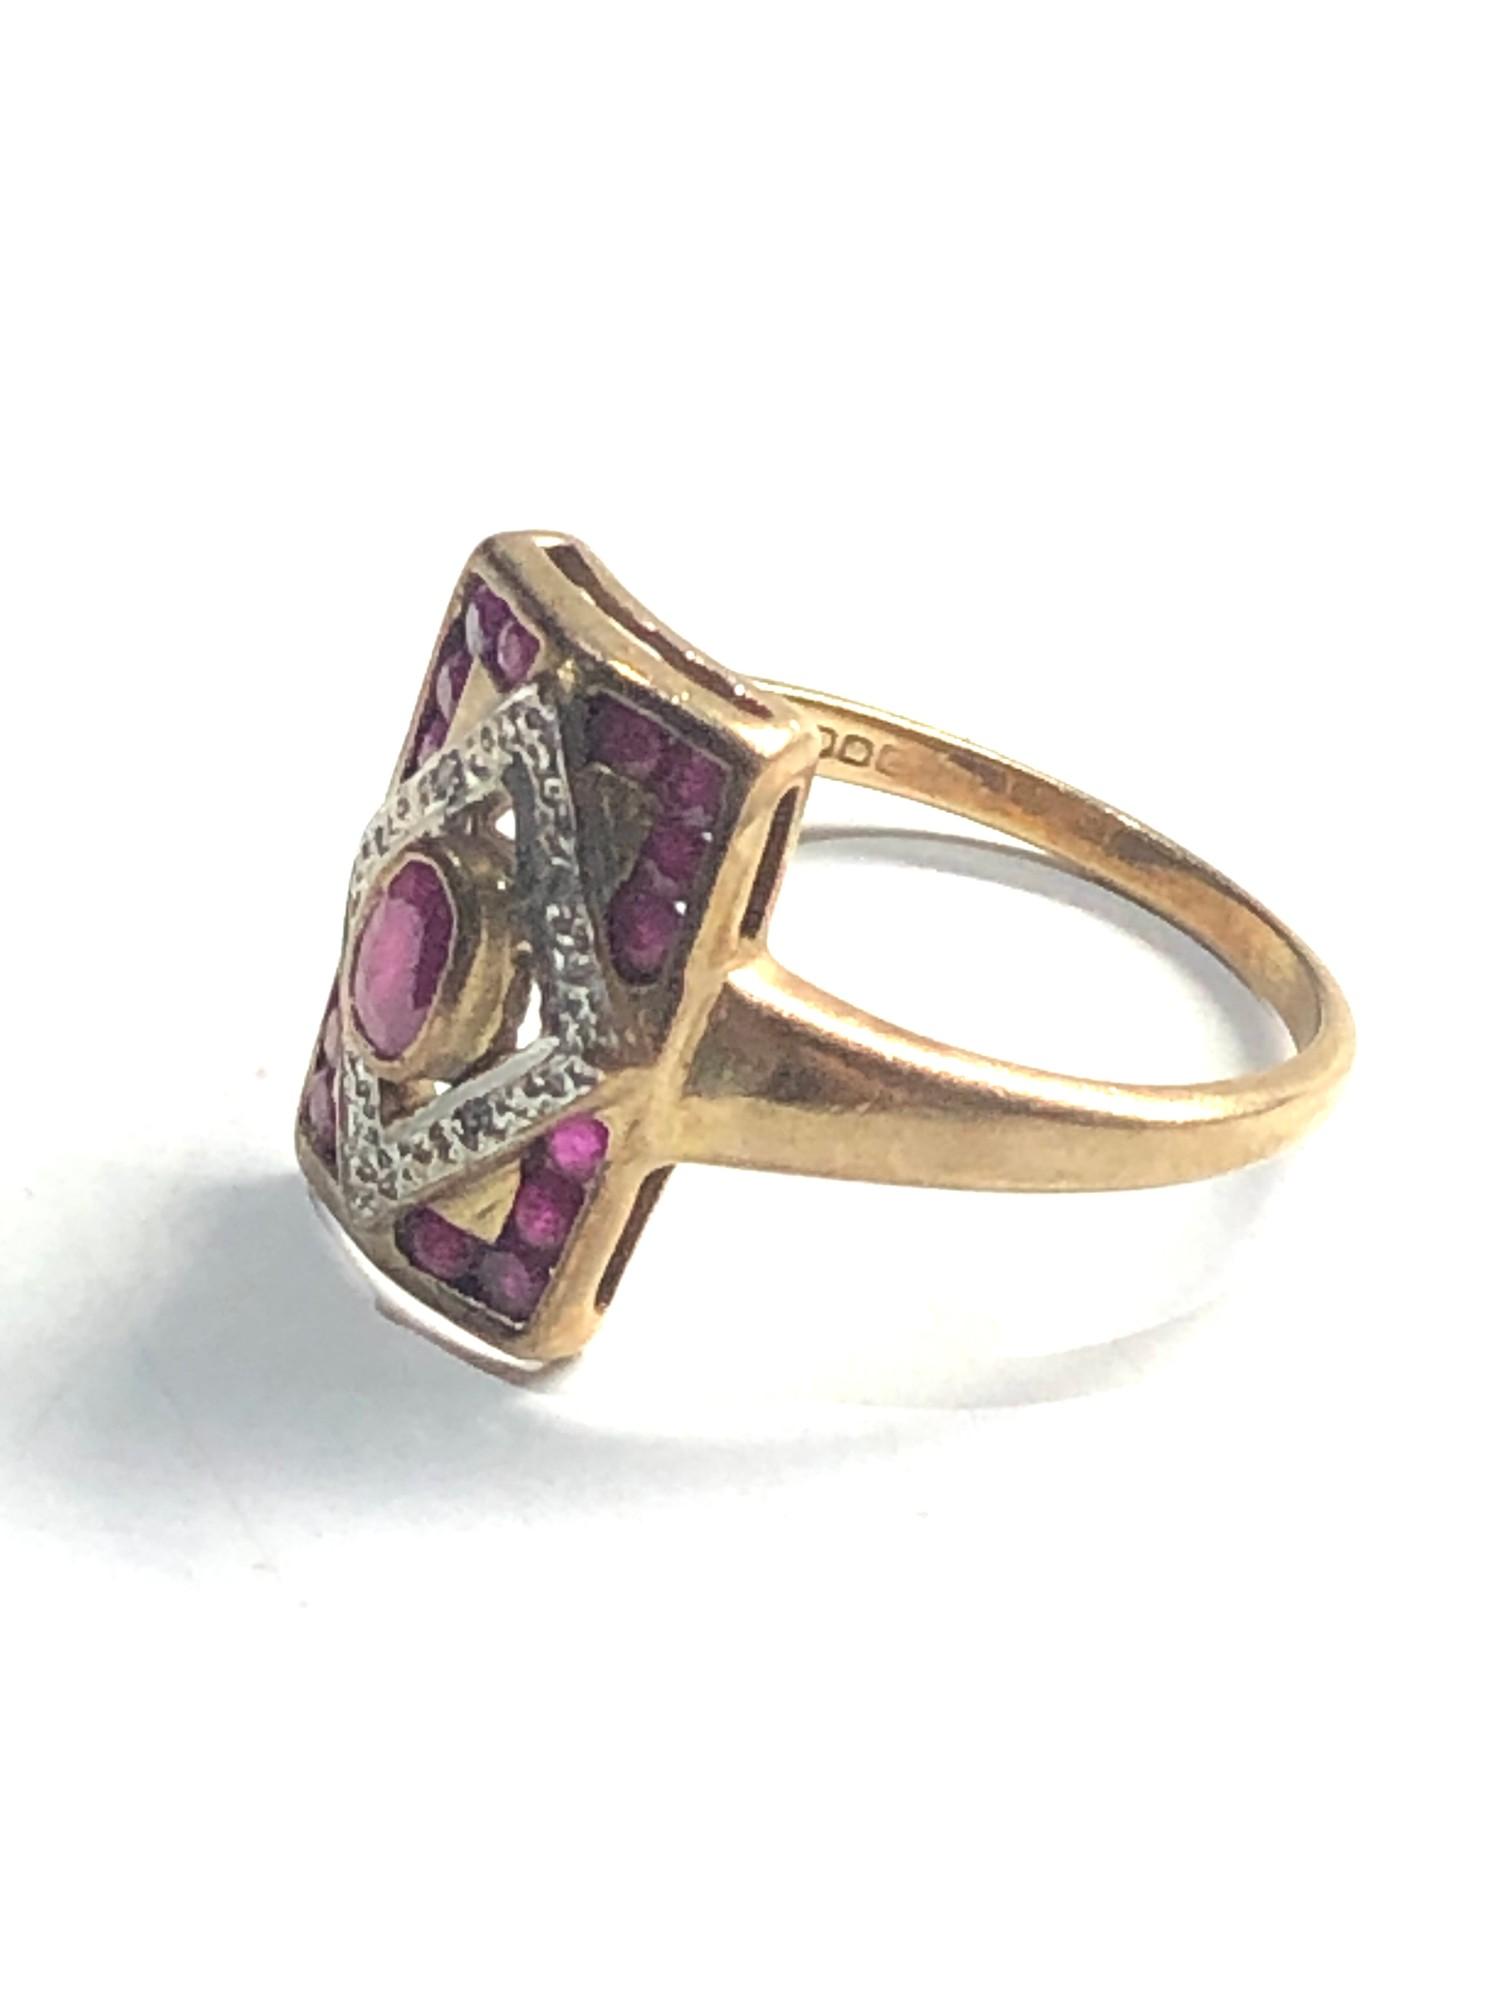 Vintage 9ct Gold ruby ring w/ diamond detail 4g - Image 2 of 3